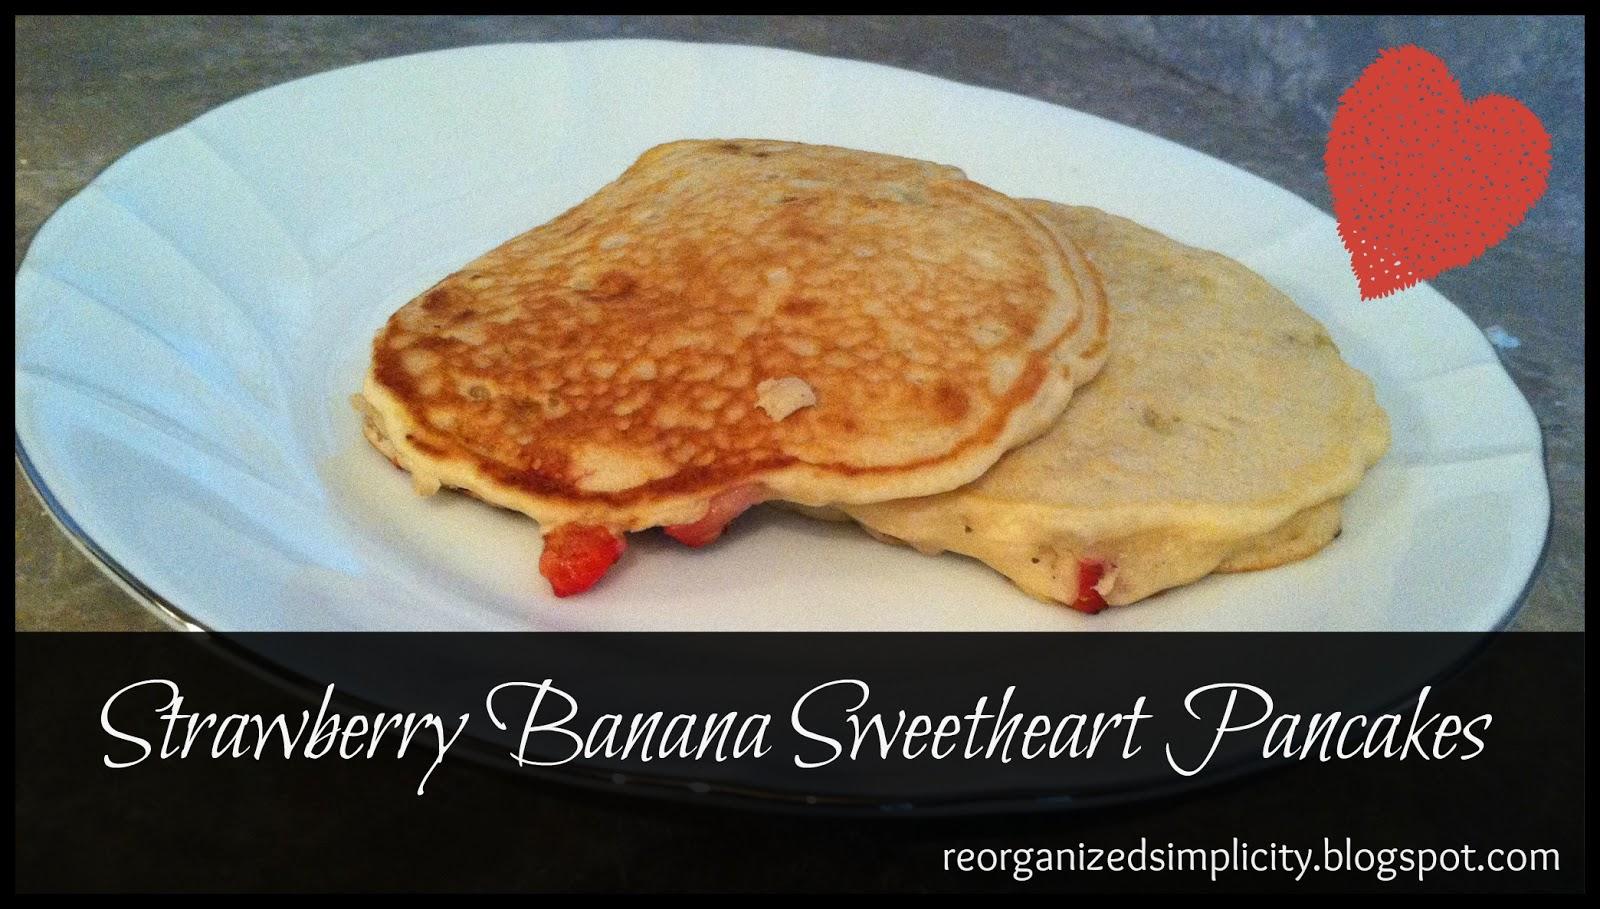 Reorganized Simplicity: Valentine's Menu: Week of 2/11